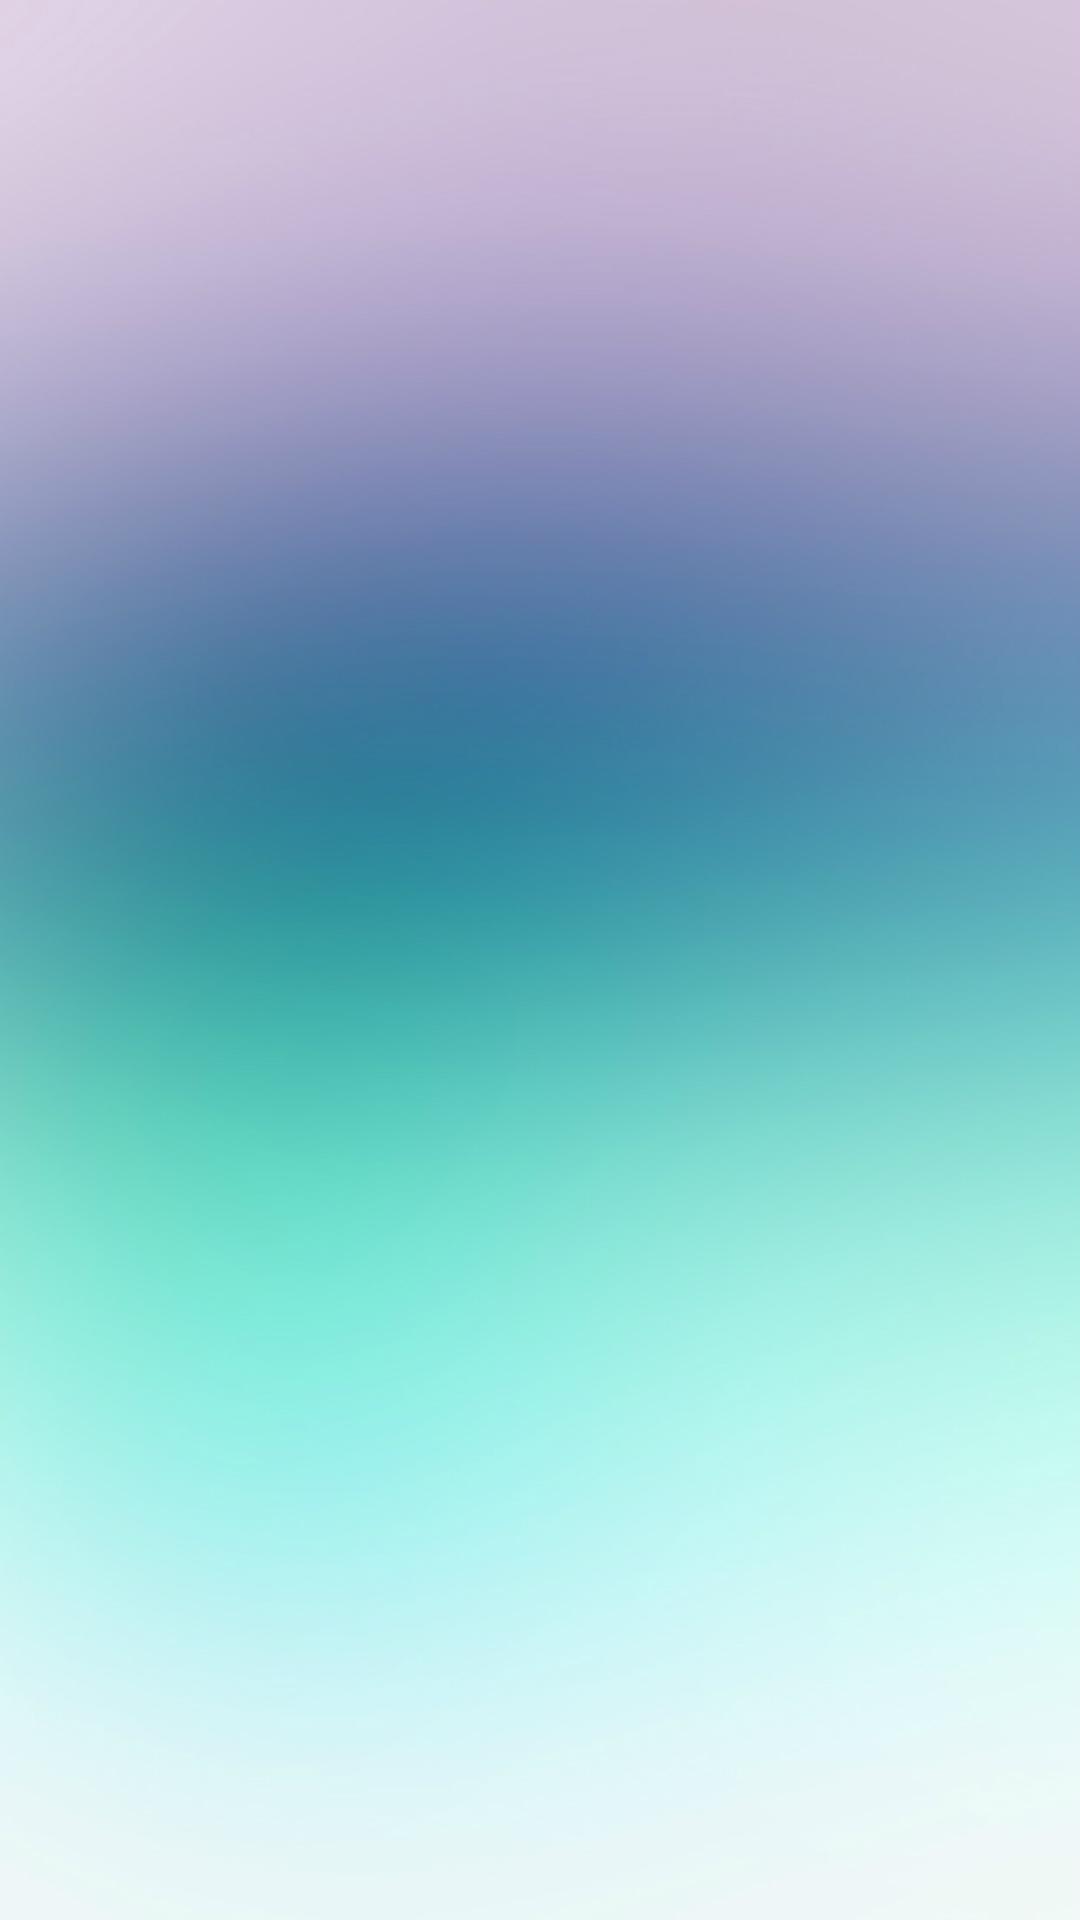 Beautiful Gradient Iphone Wallpaper